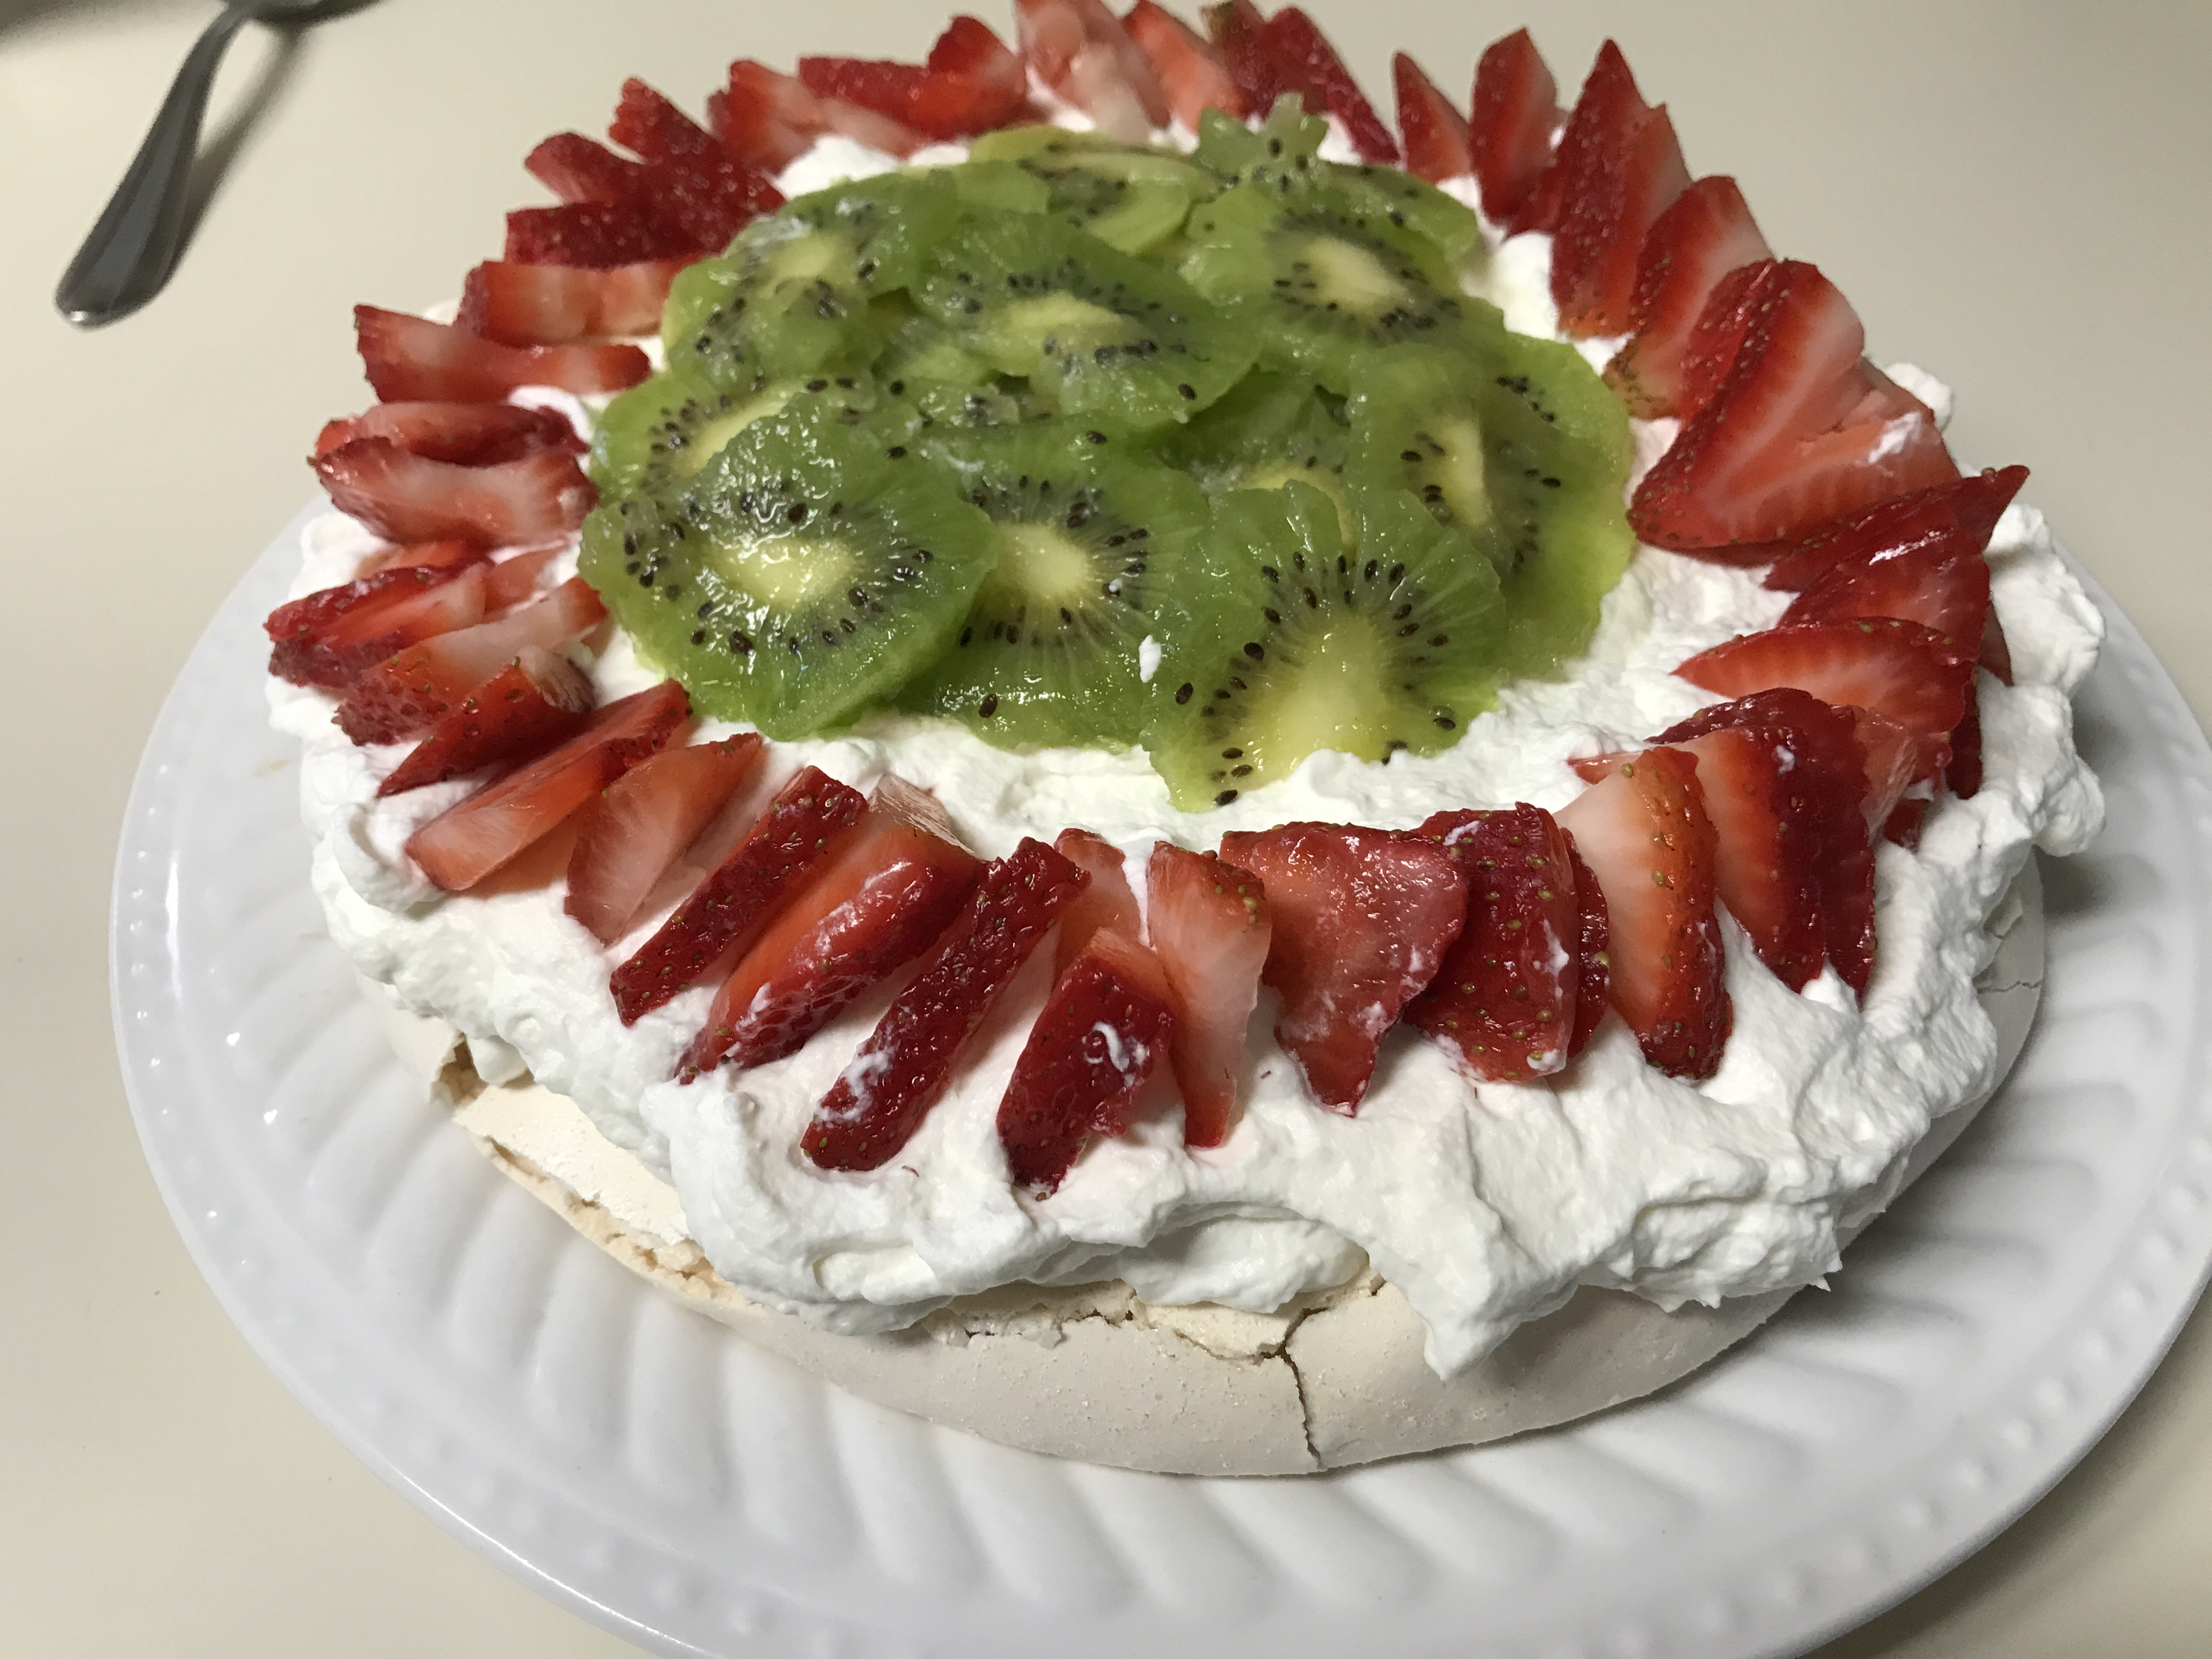 Chef John's Pavlova with Strawberries jennifer moore